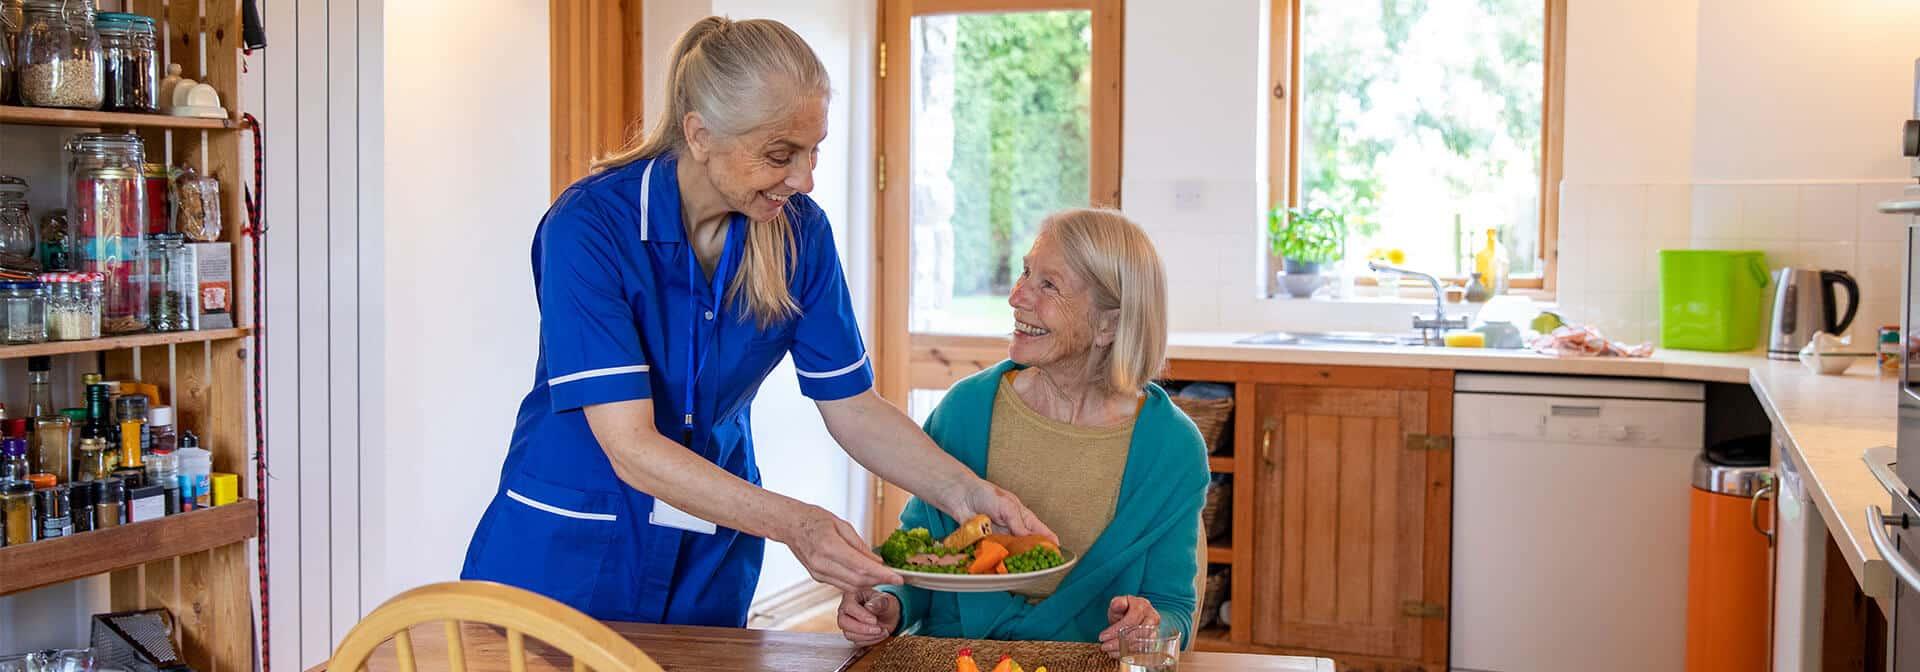 Caregiver serving client a meal